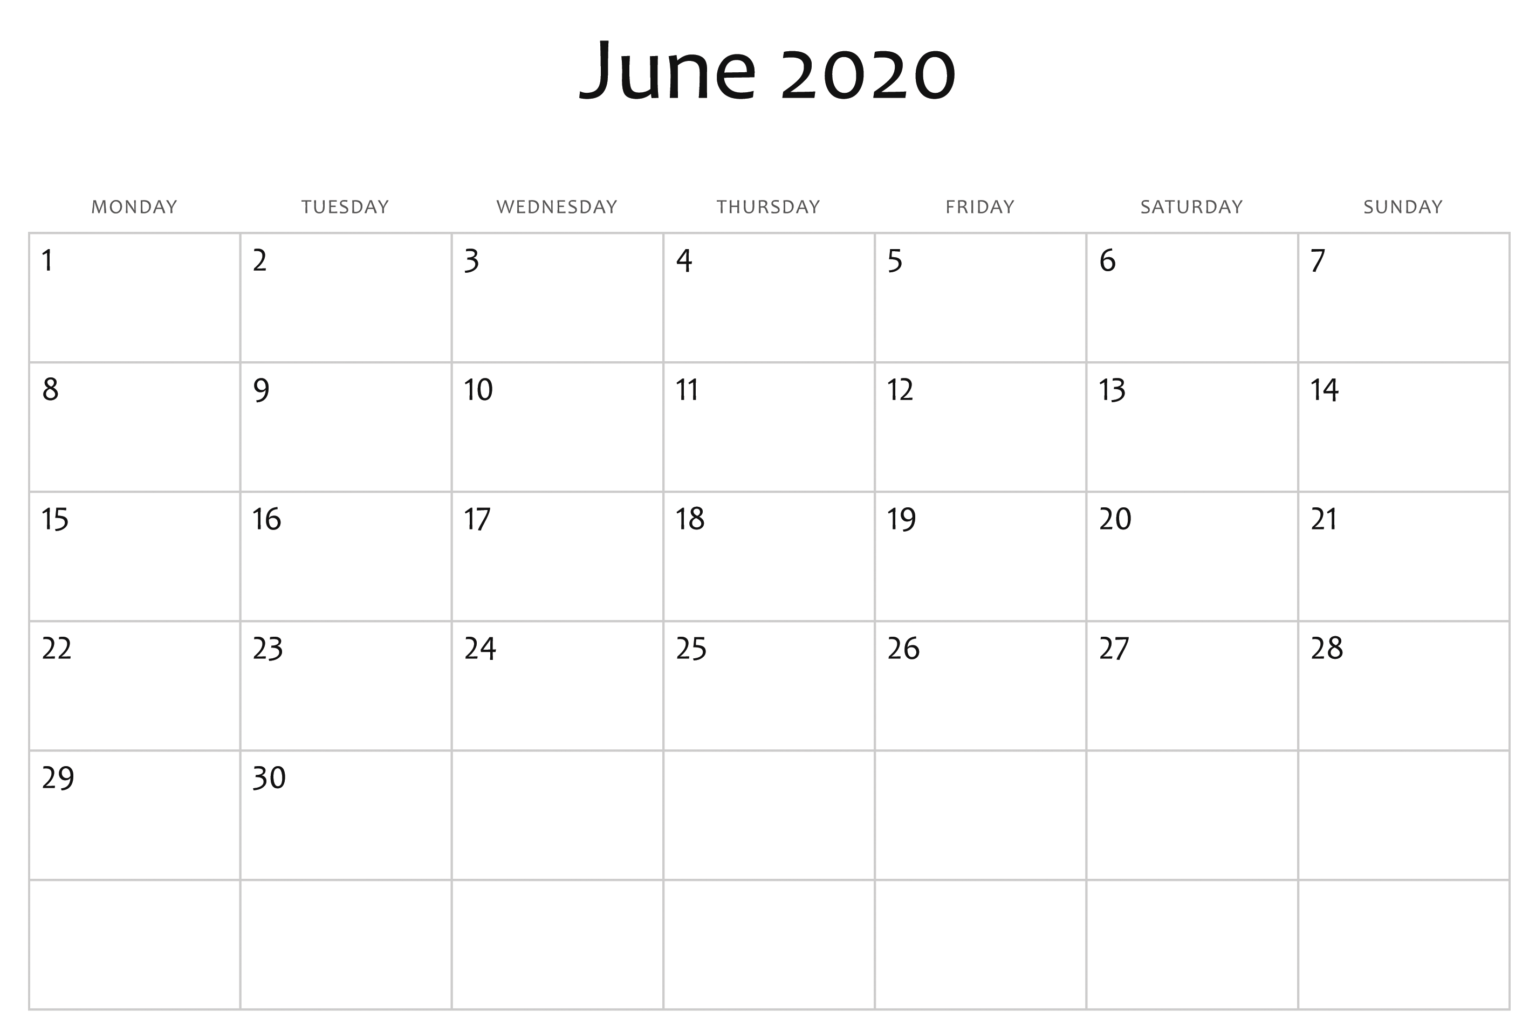 Print June 2020 Calendar Excel Sheet Free Printable Calendar In 2020 Excel Calendar Free Printable Calendar Printable Calendar